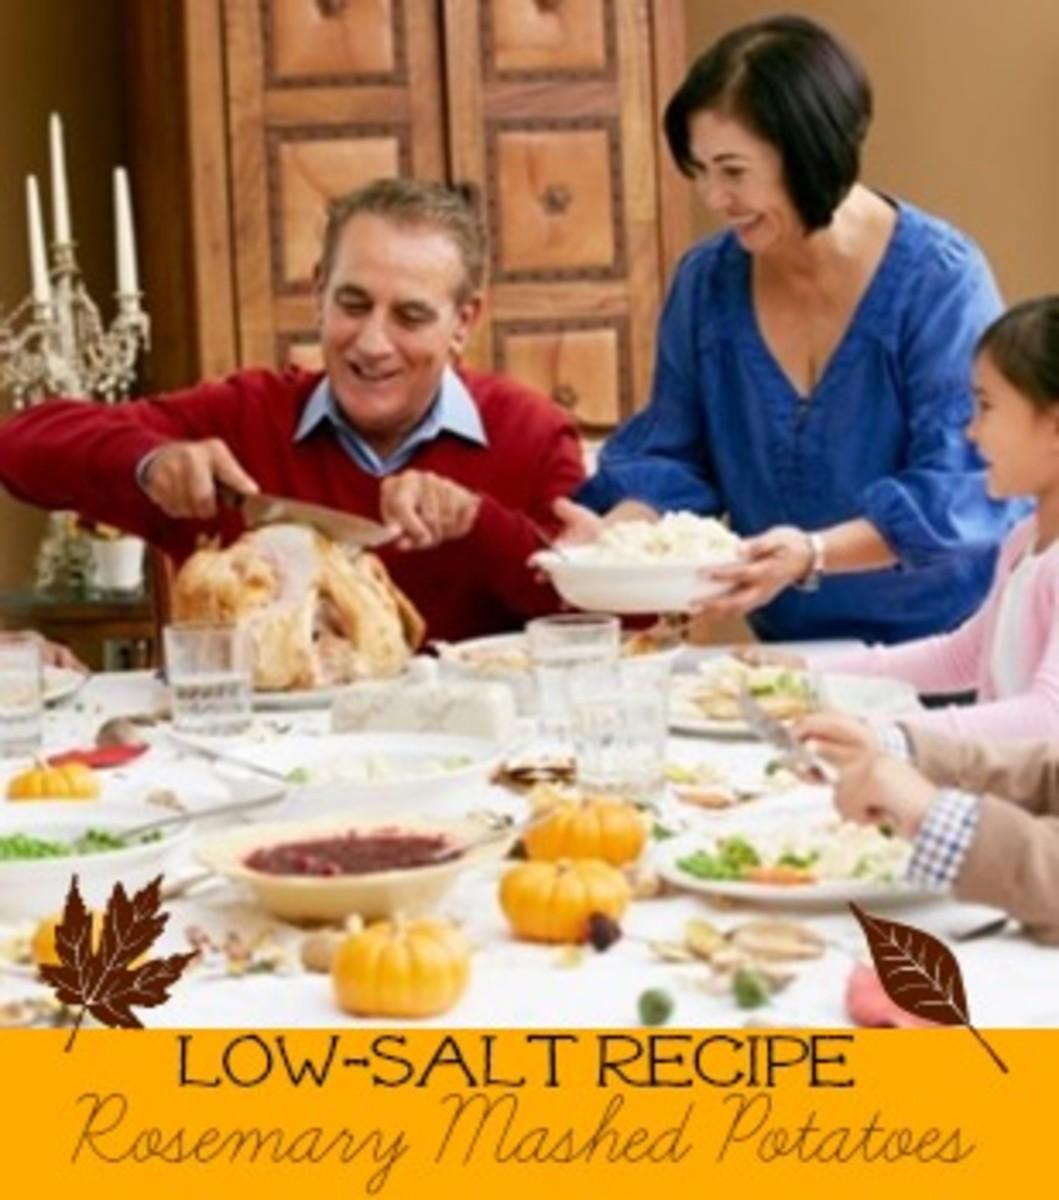 low salt recipes, healthy holiday recipes, rosemary mashed potatoes